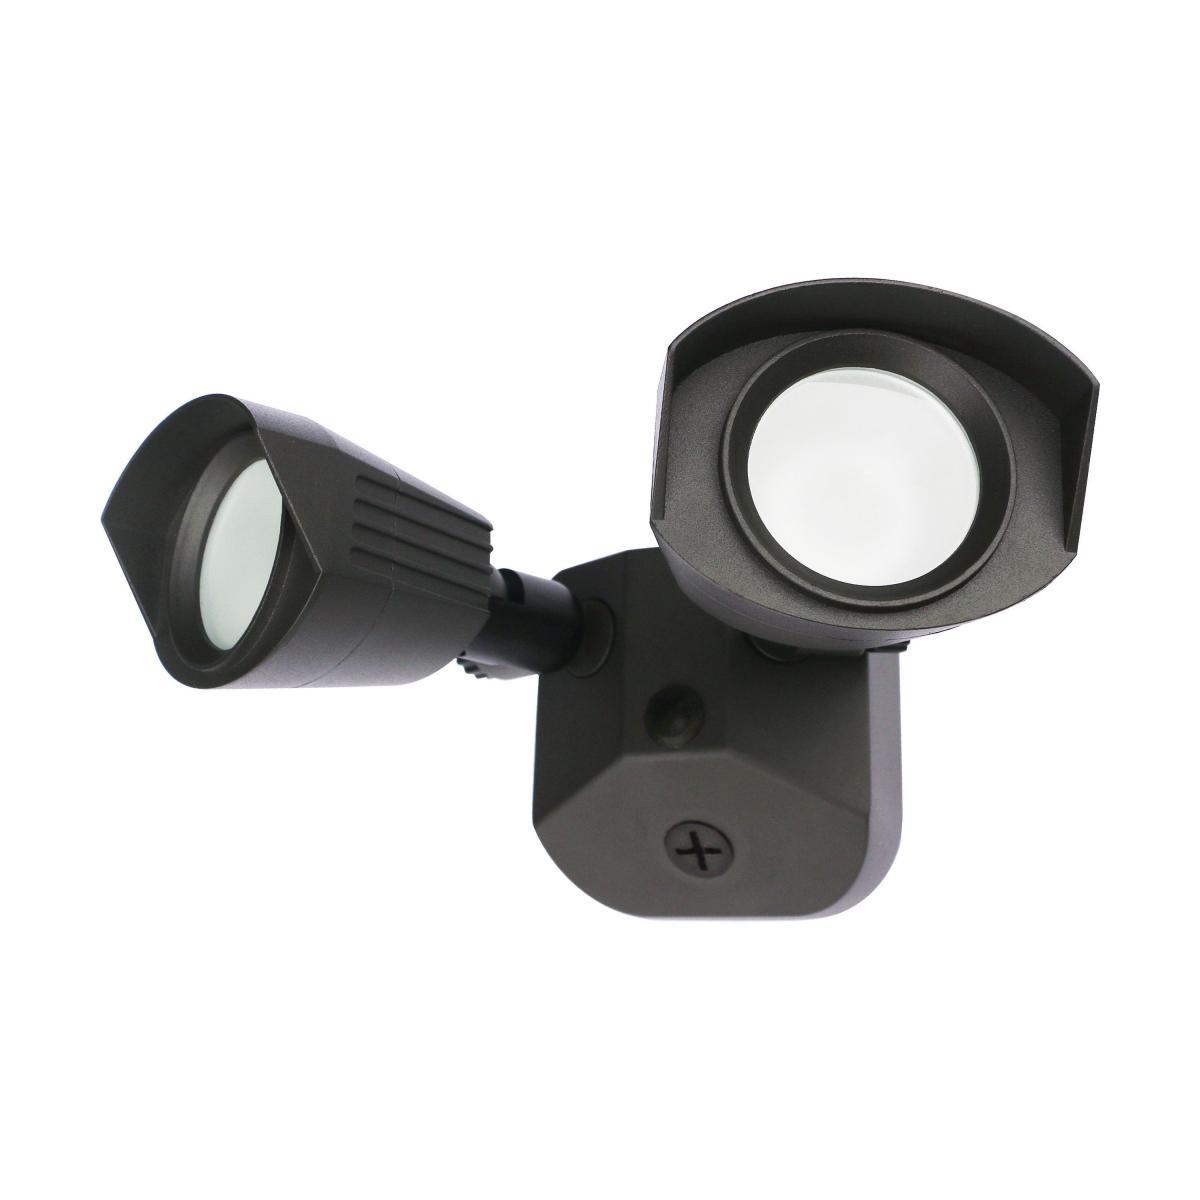 65-218 LED DUAL HEAD SECURITY LIGHT